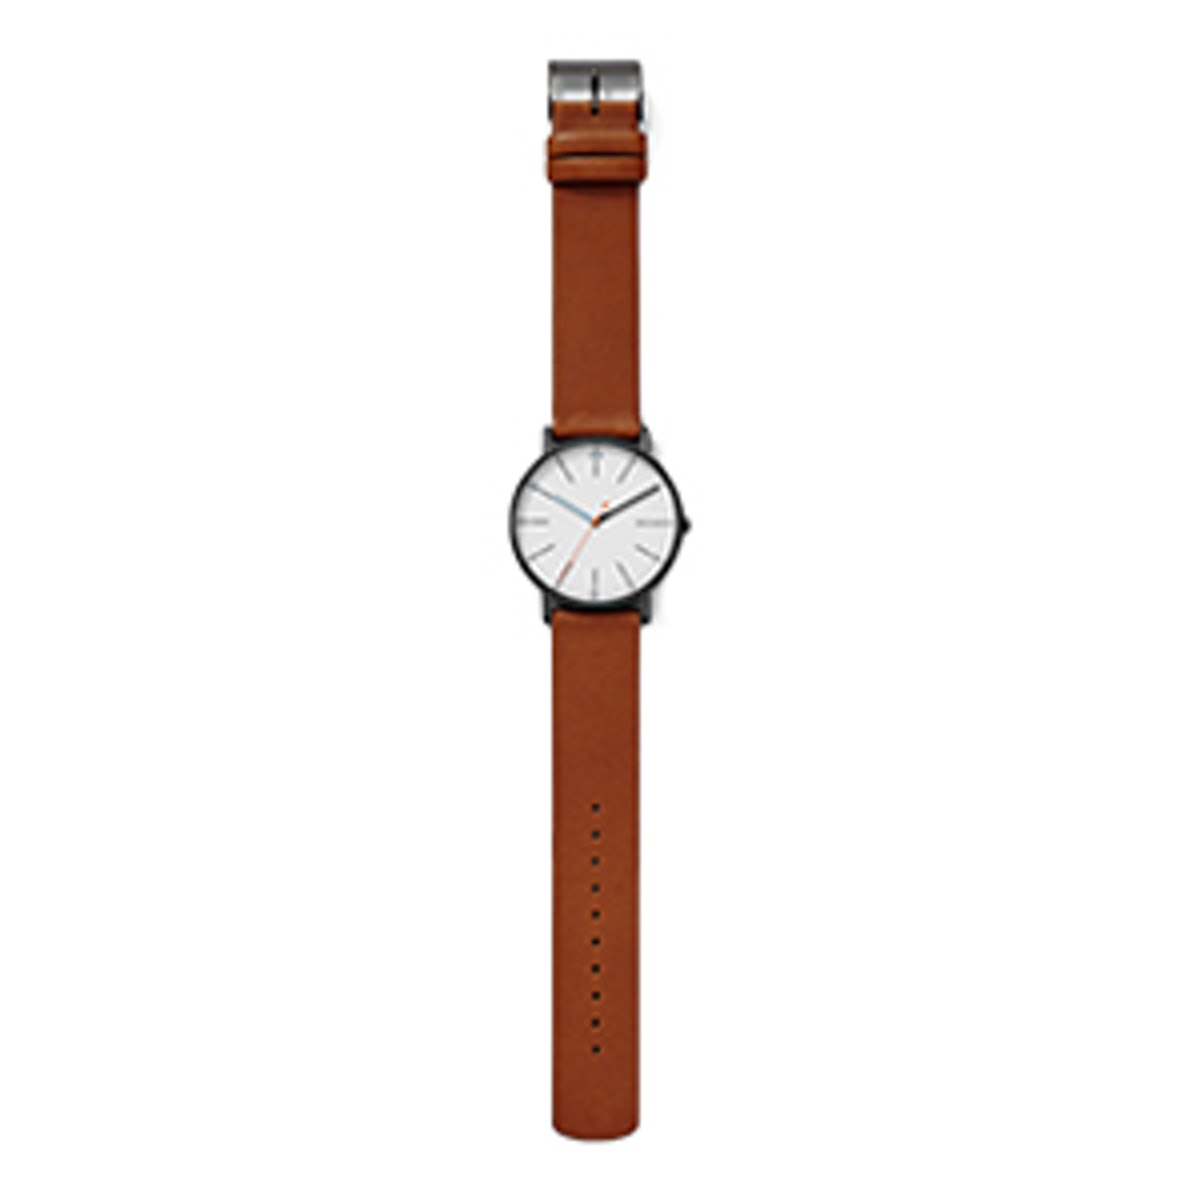 Signatur Leather Watch